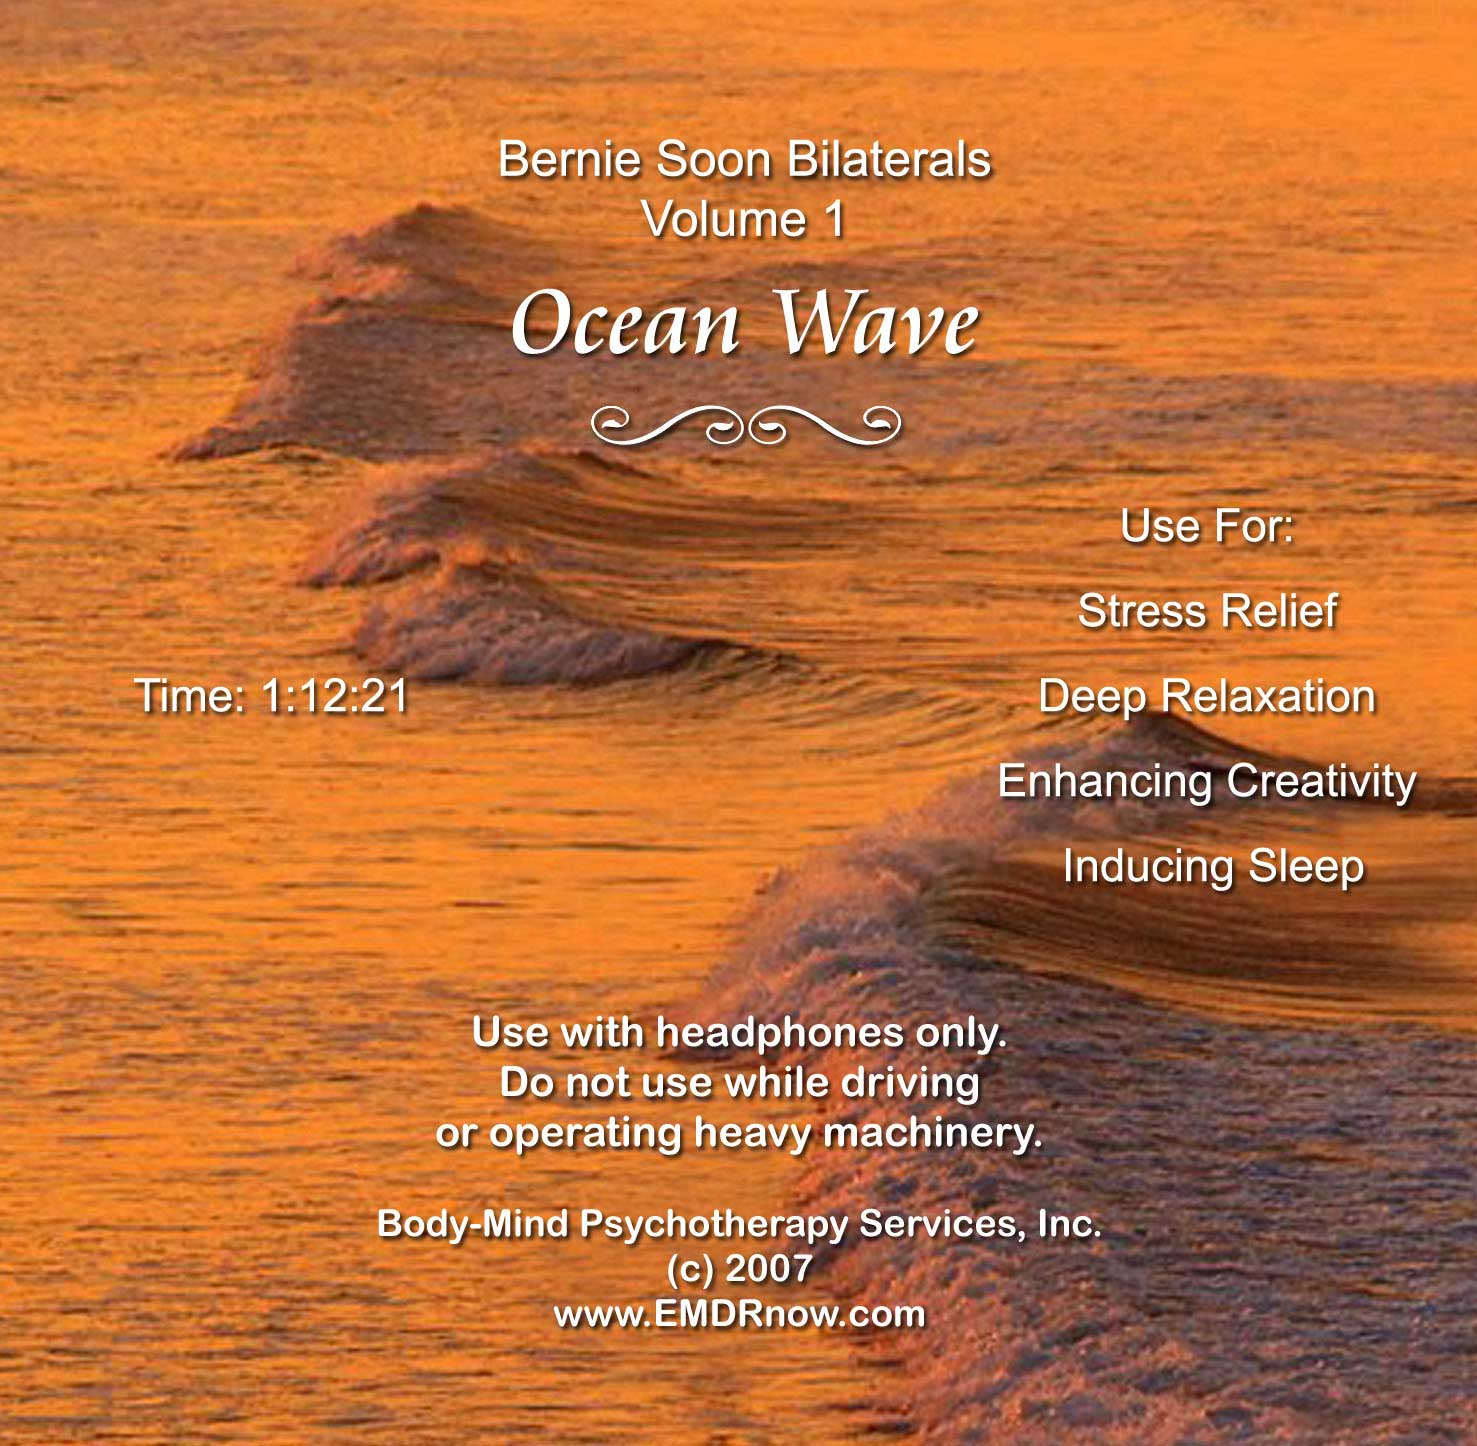 EMDR_Bilateral_CD_Vol1_Ocean_Wave